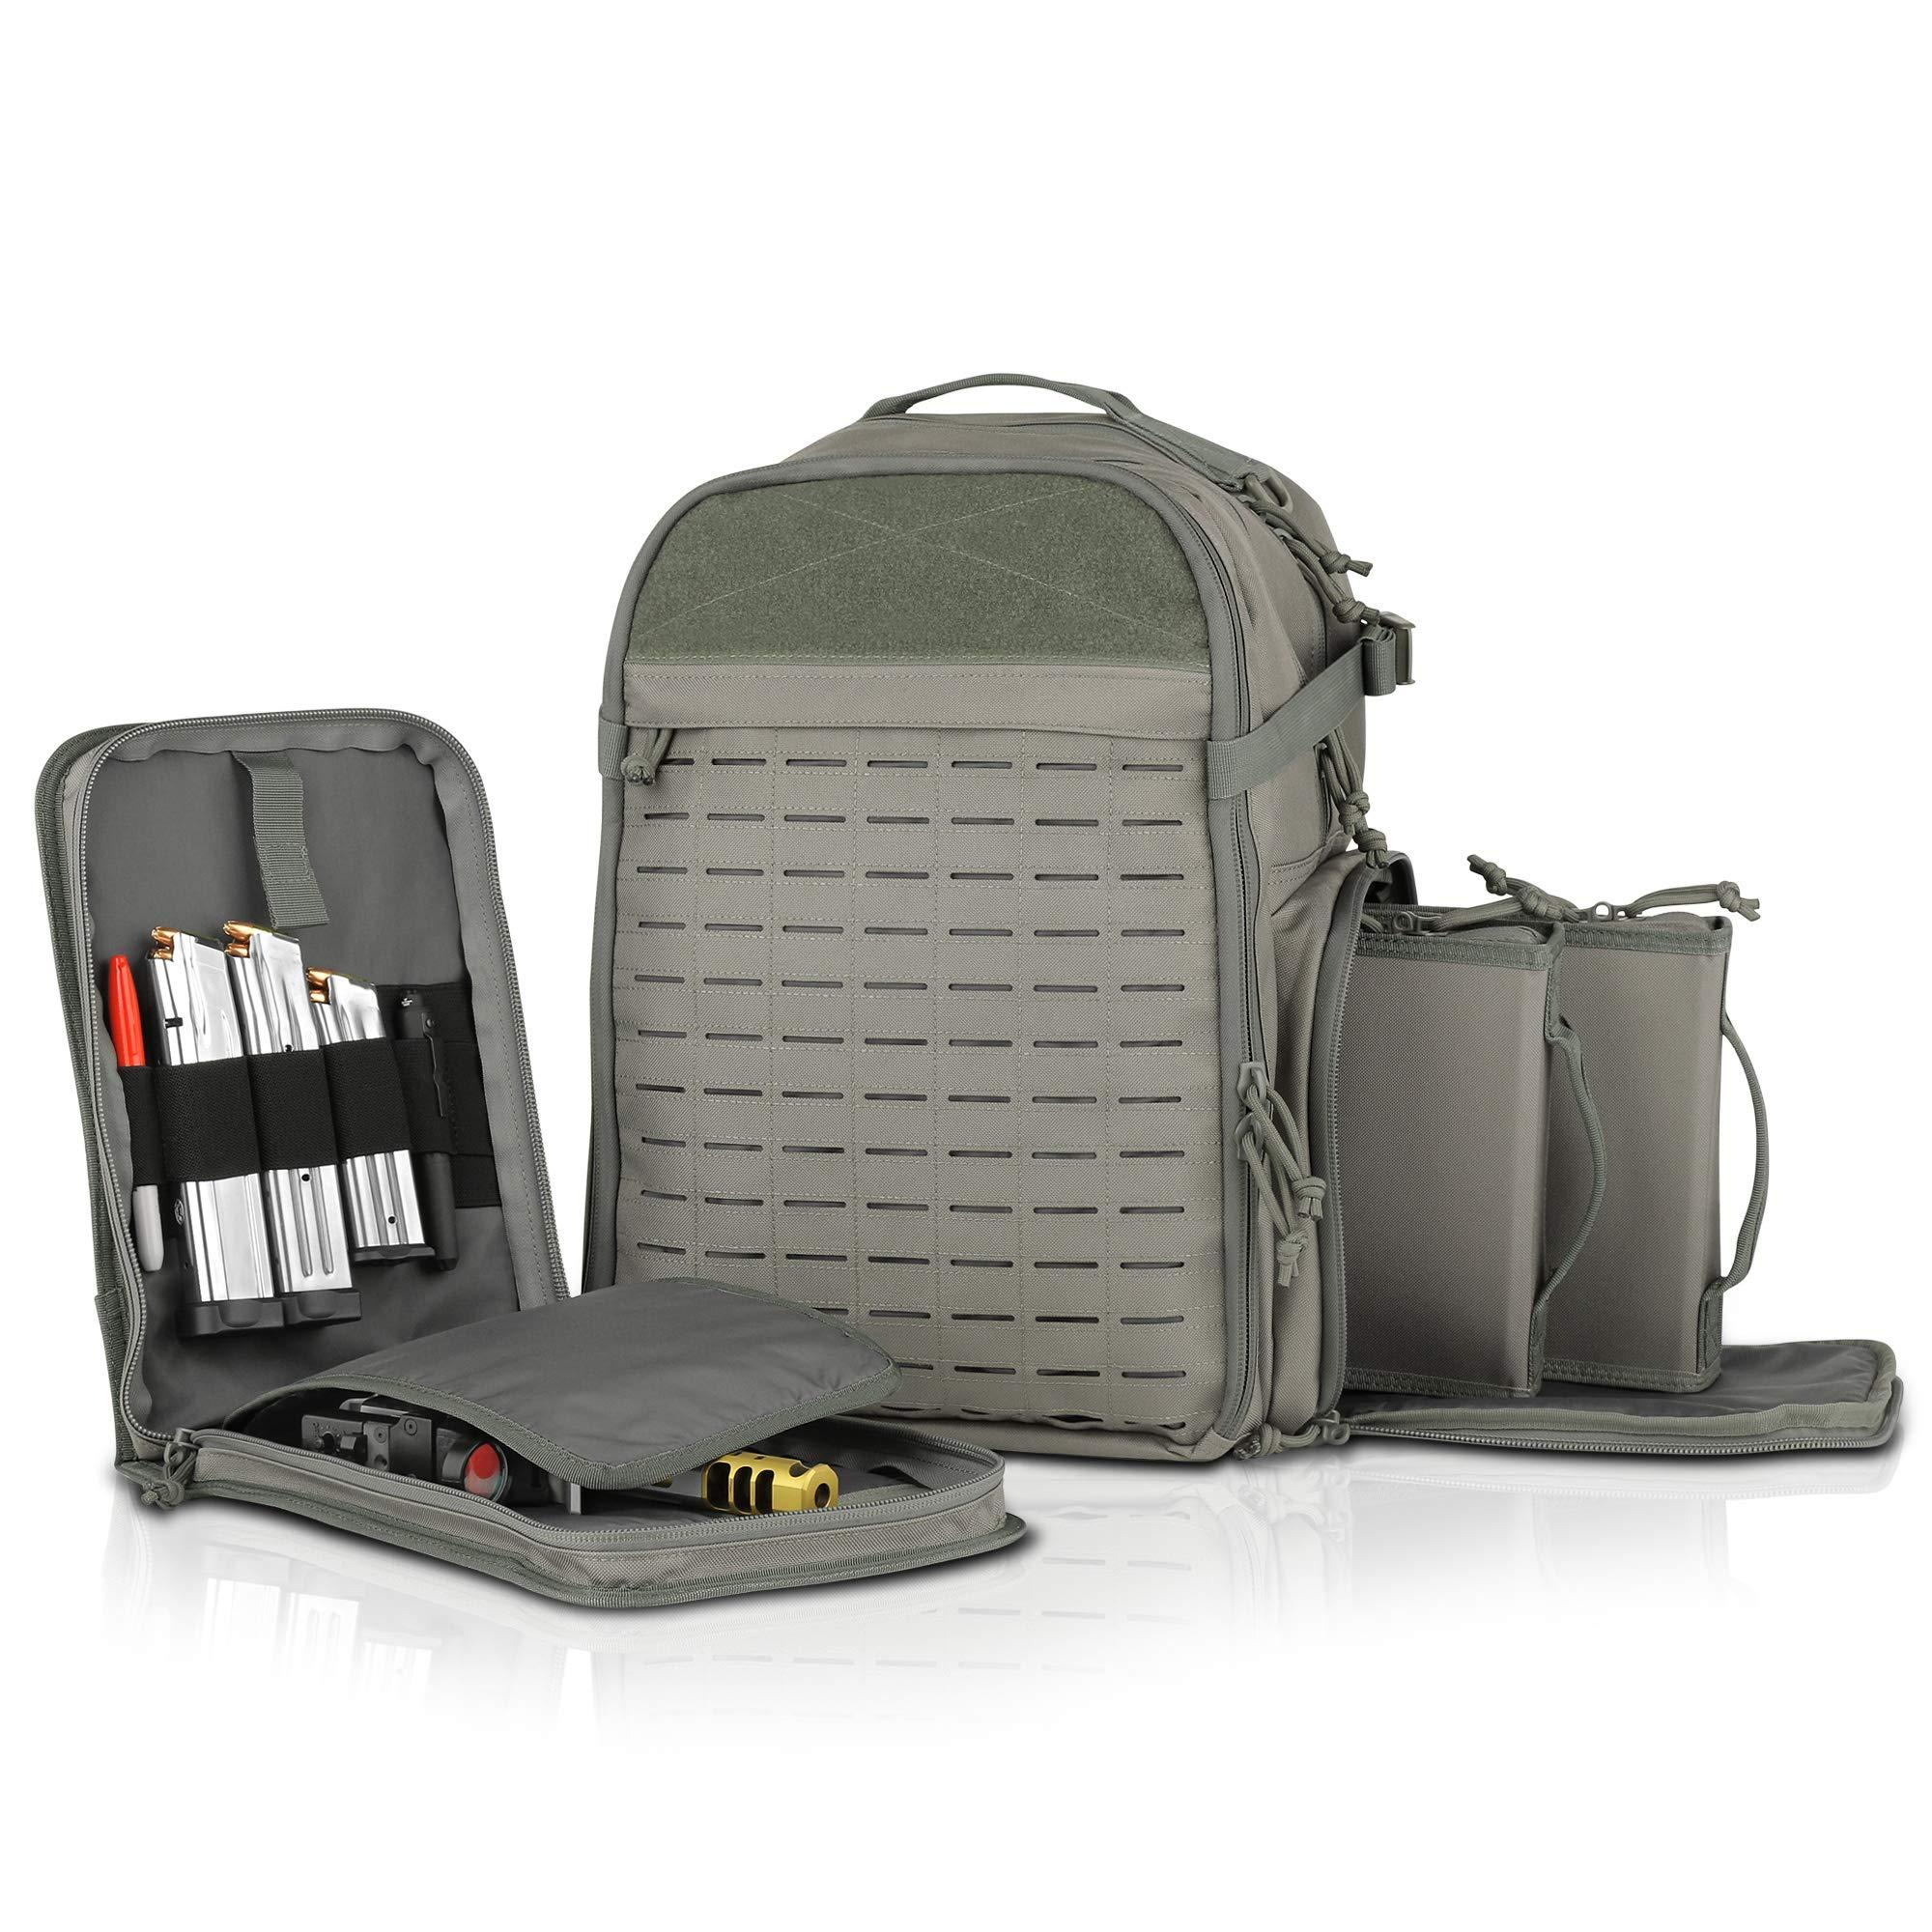 Savior Equipment Mobile Arsenal SEMA 27L Tactical Range Bag Backpack Pistol Case by Savior Equipment